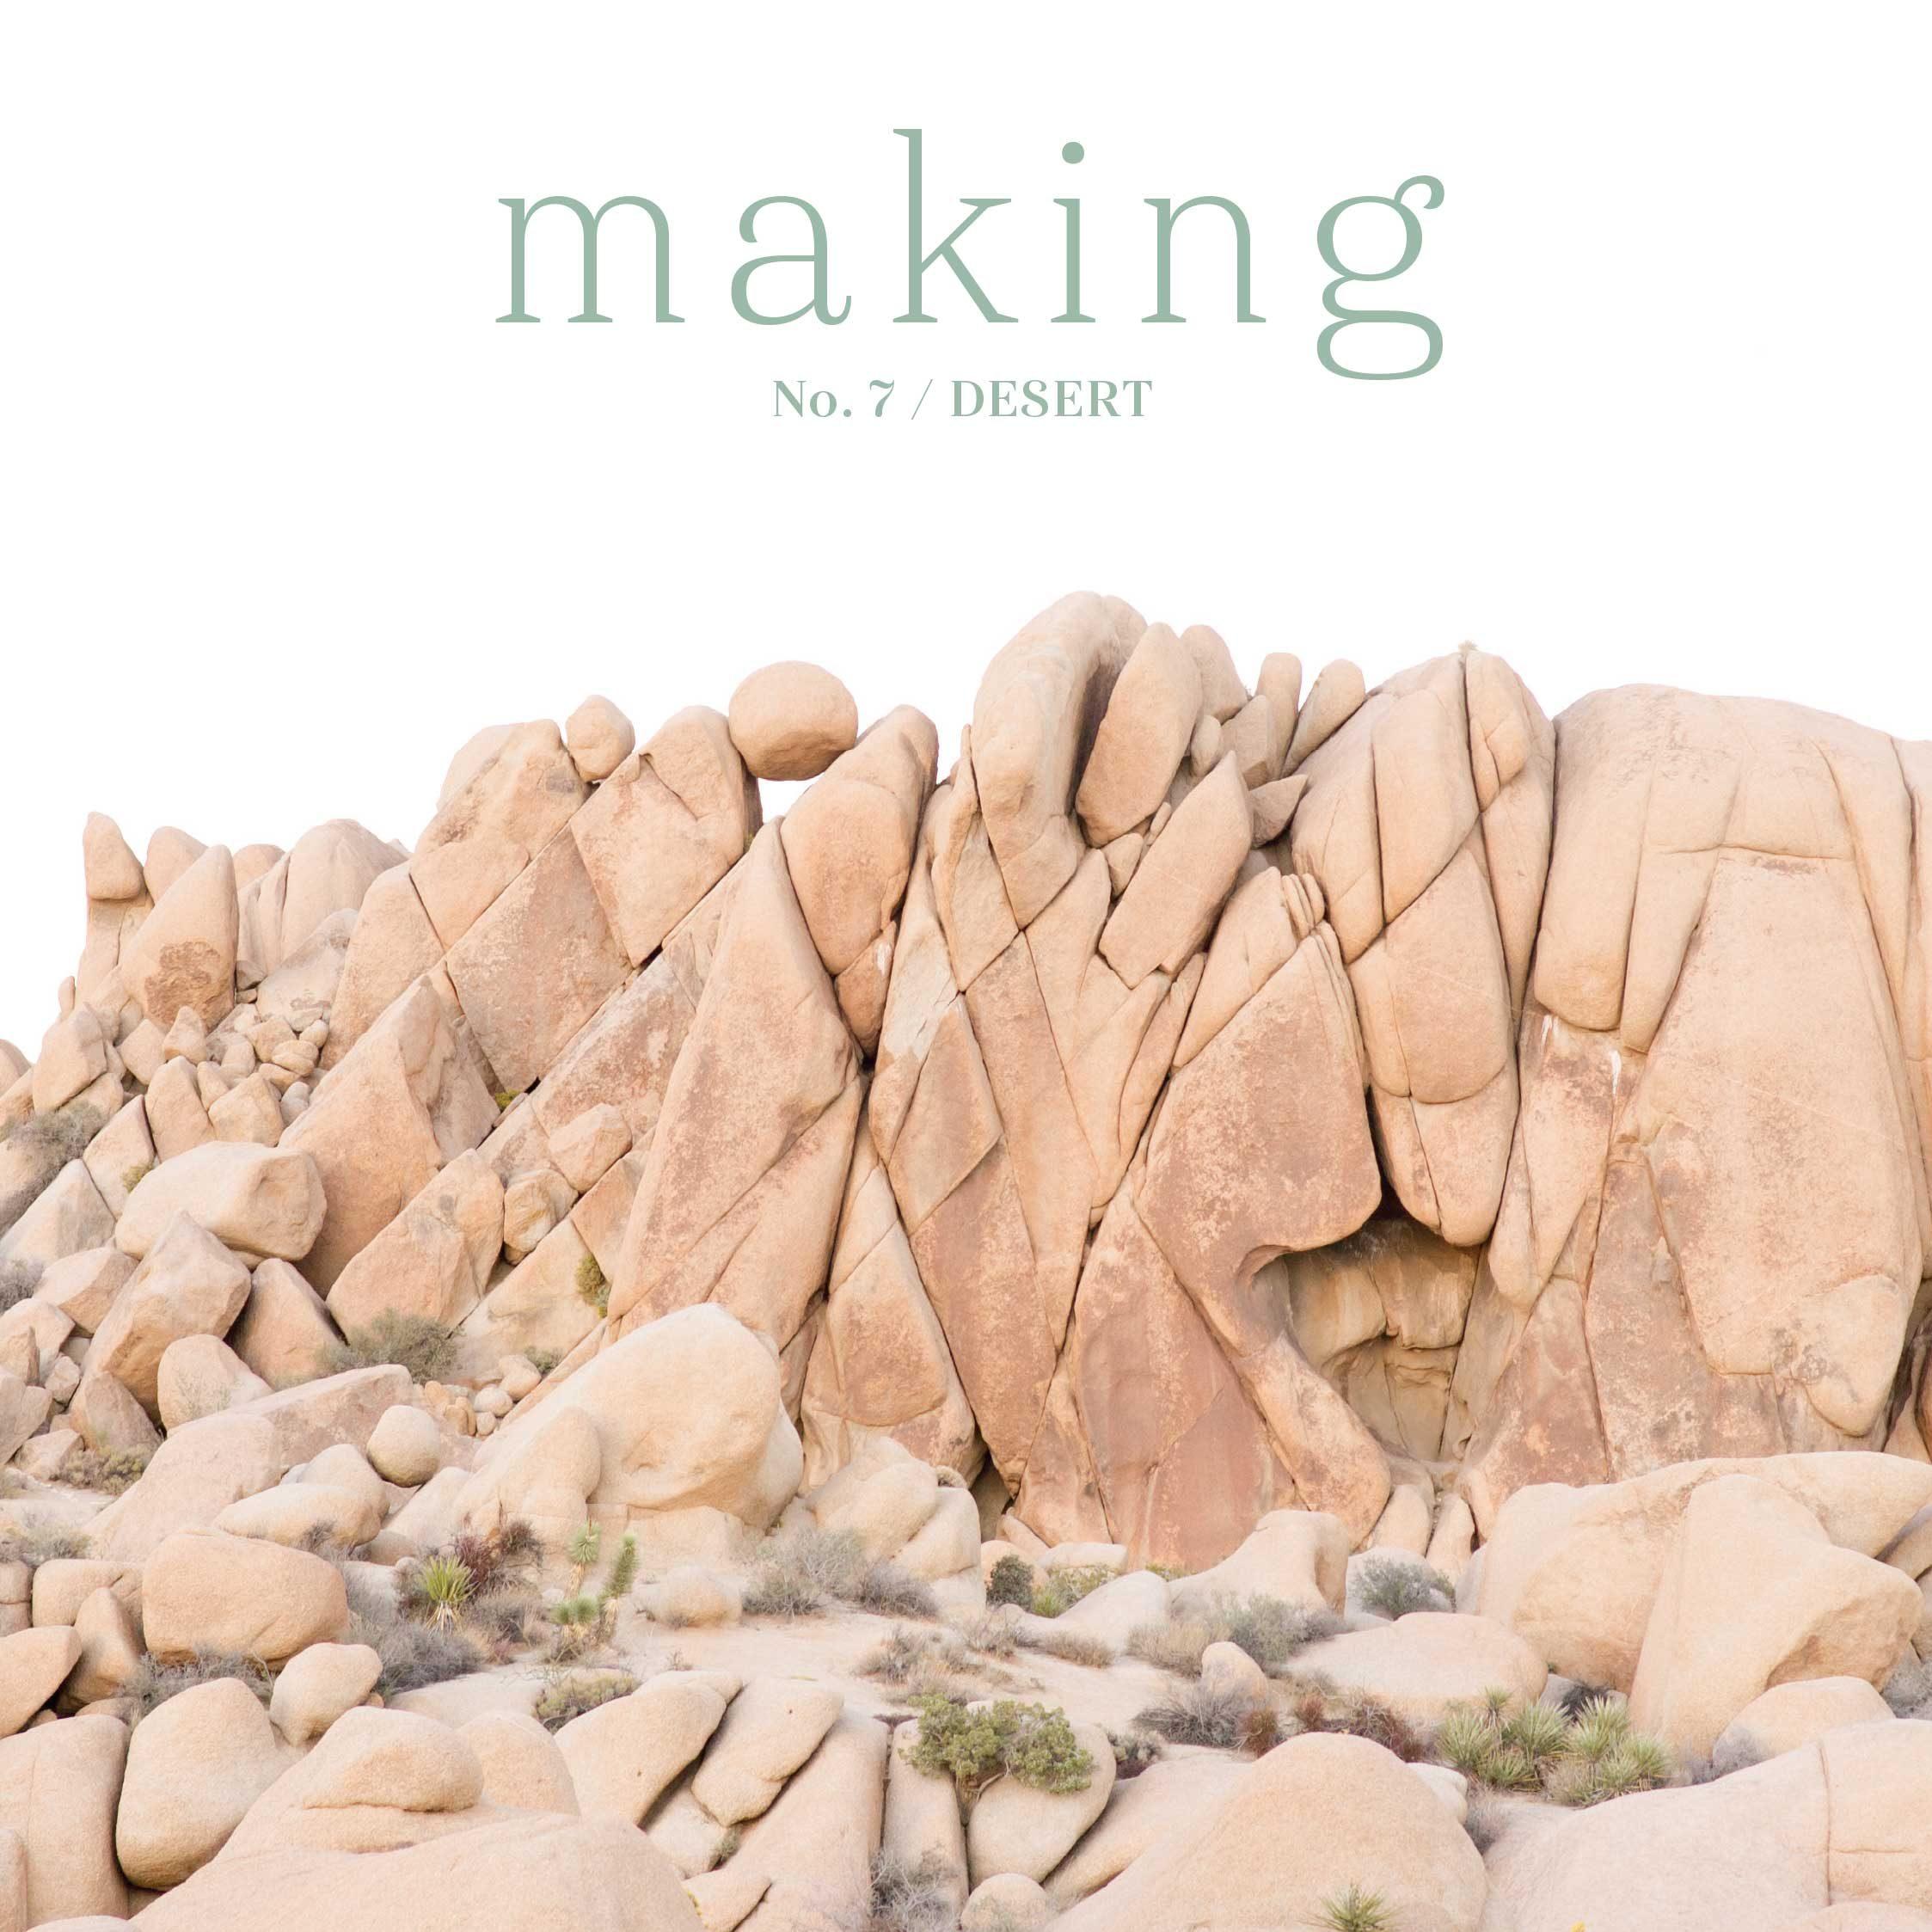 Making Magazine, Issue 7 Desert